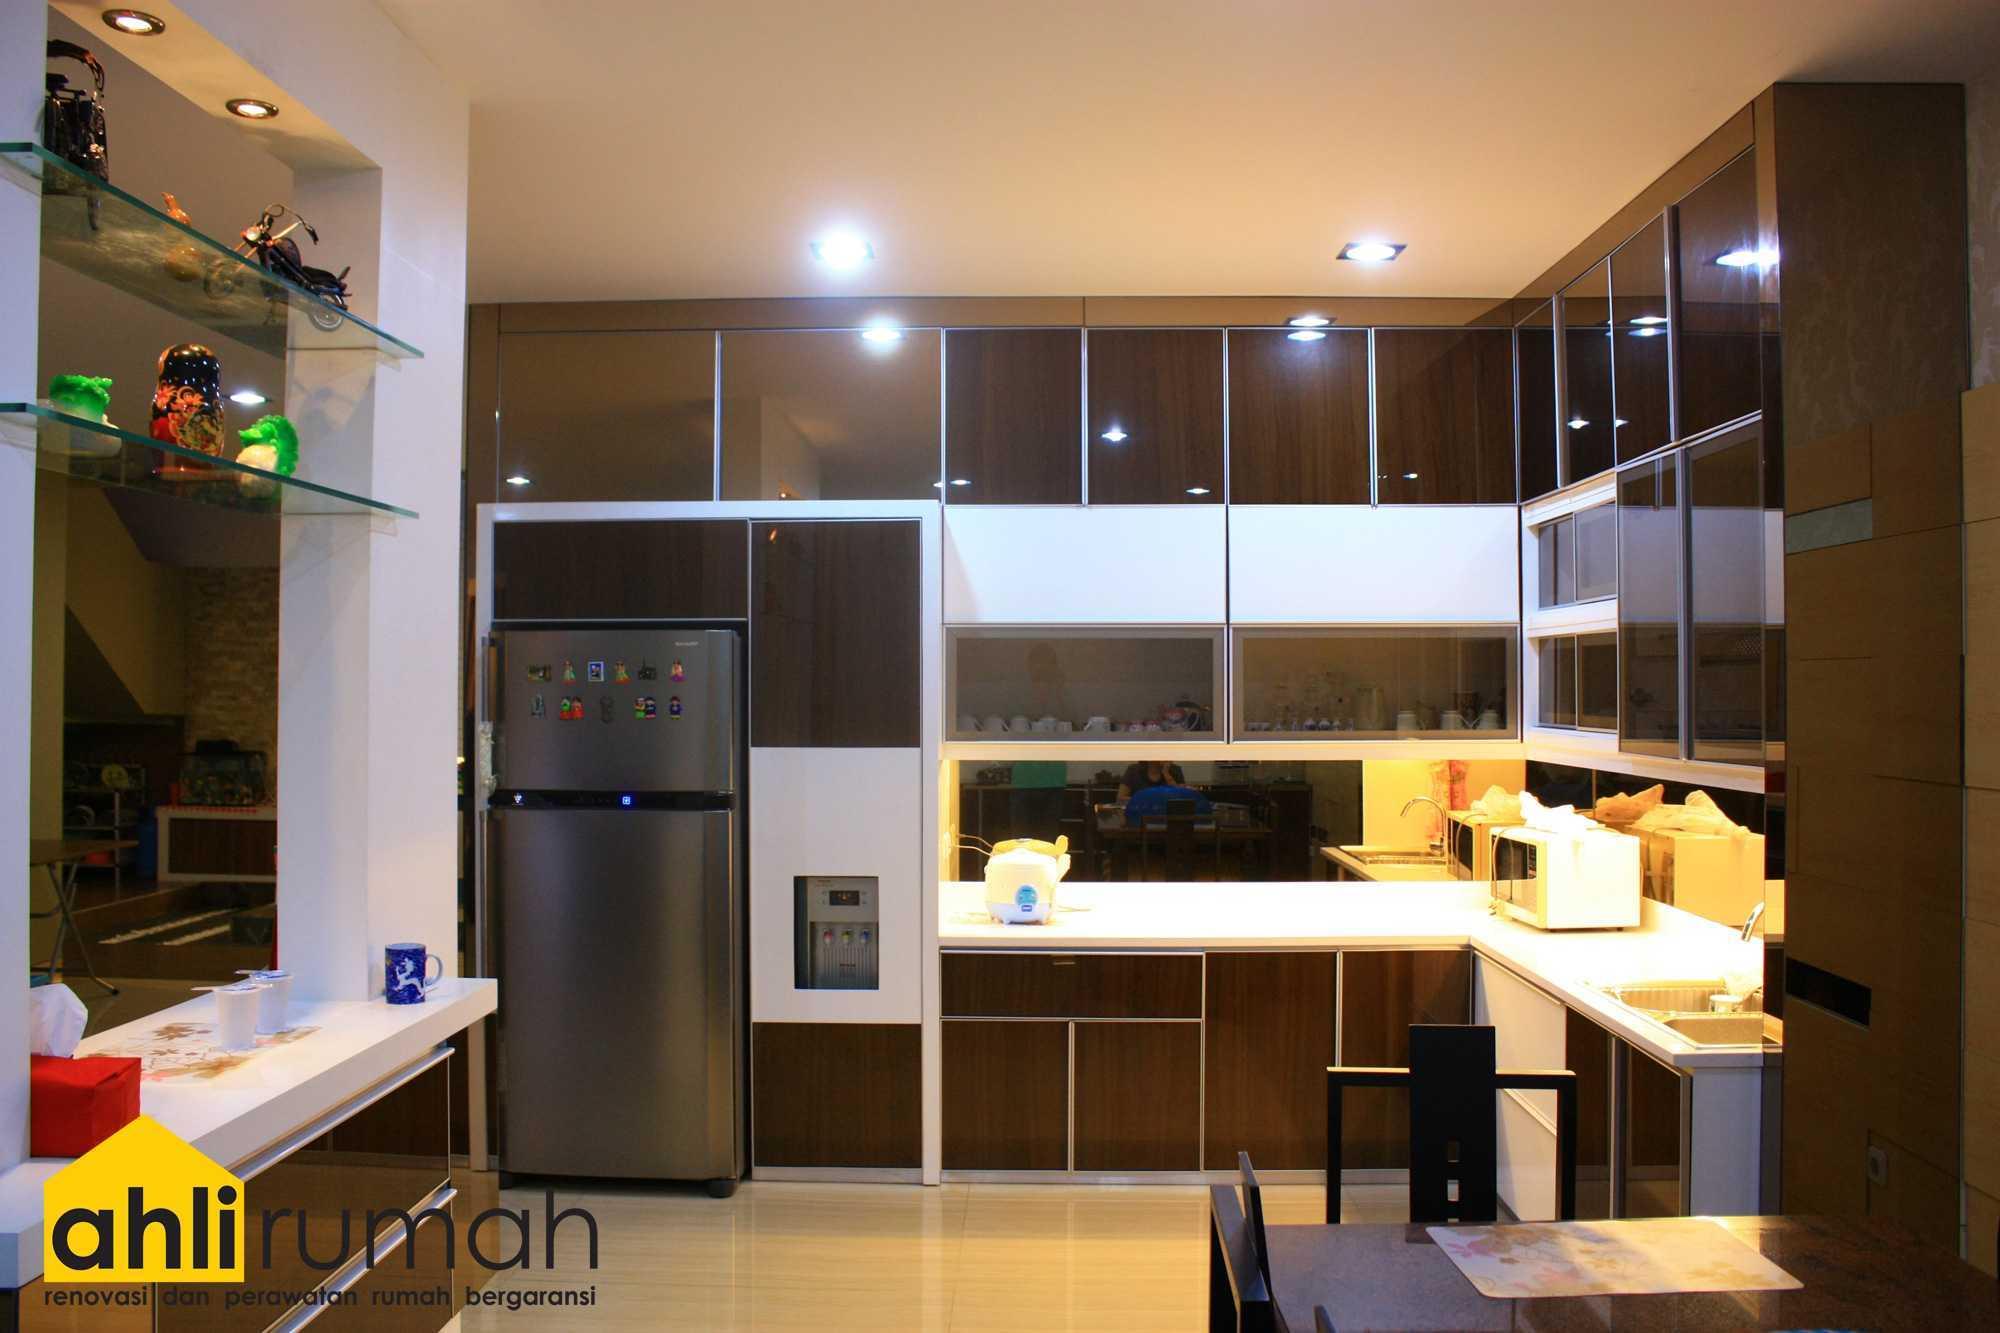 Ahlirumah.id Interior - Rumah Ibu C Daerah Khusus Ibukota Jakarta, Indonesia  Kitchen Area Kontemporer  49171